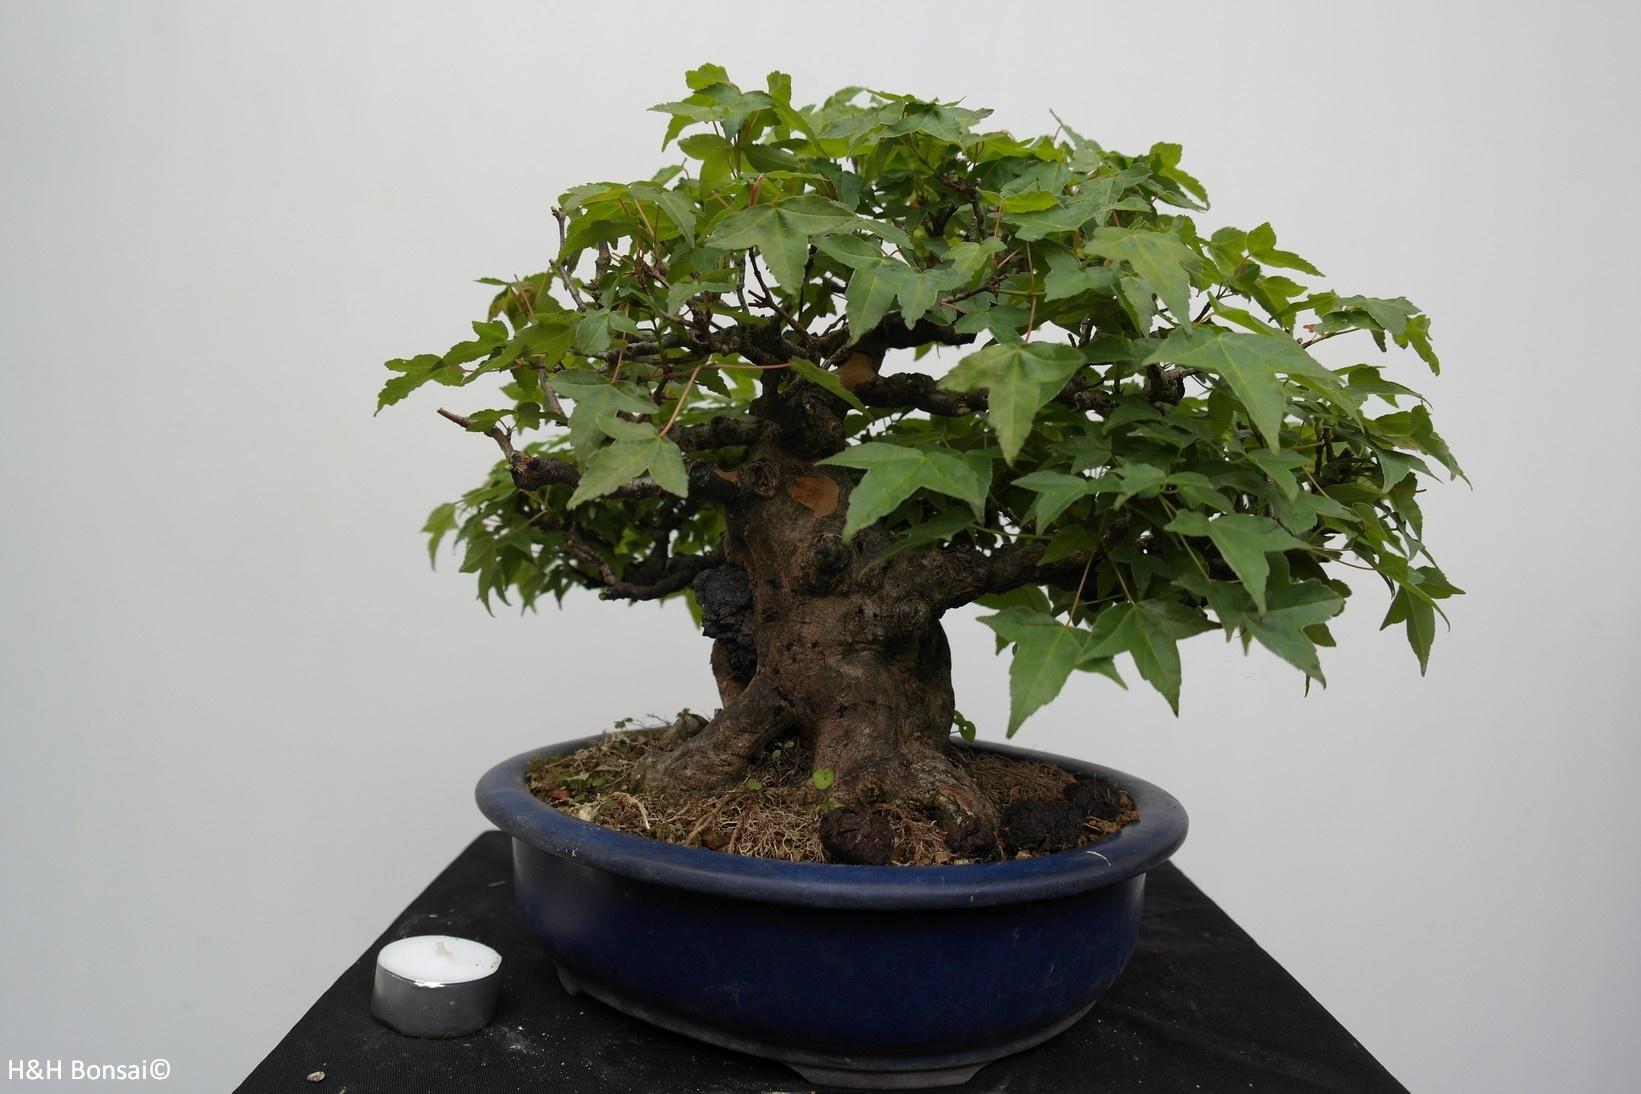 Bonsai Trident Maple, Acer buergerianum, no. 7513A